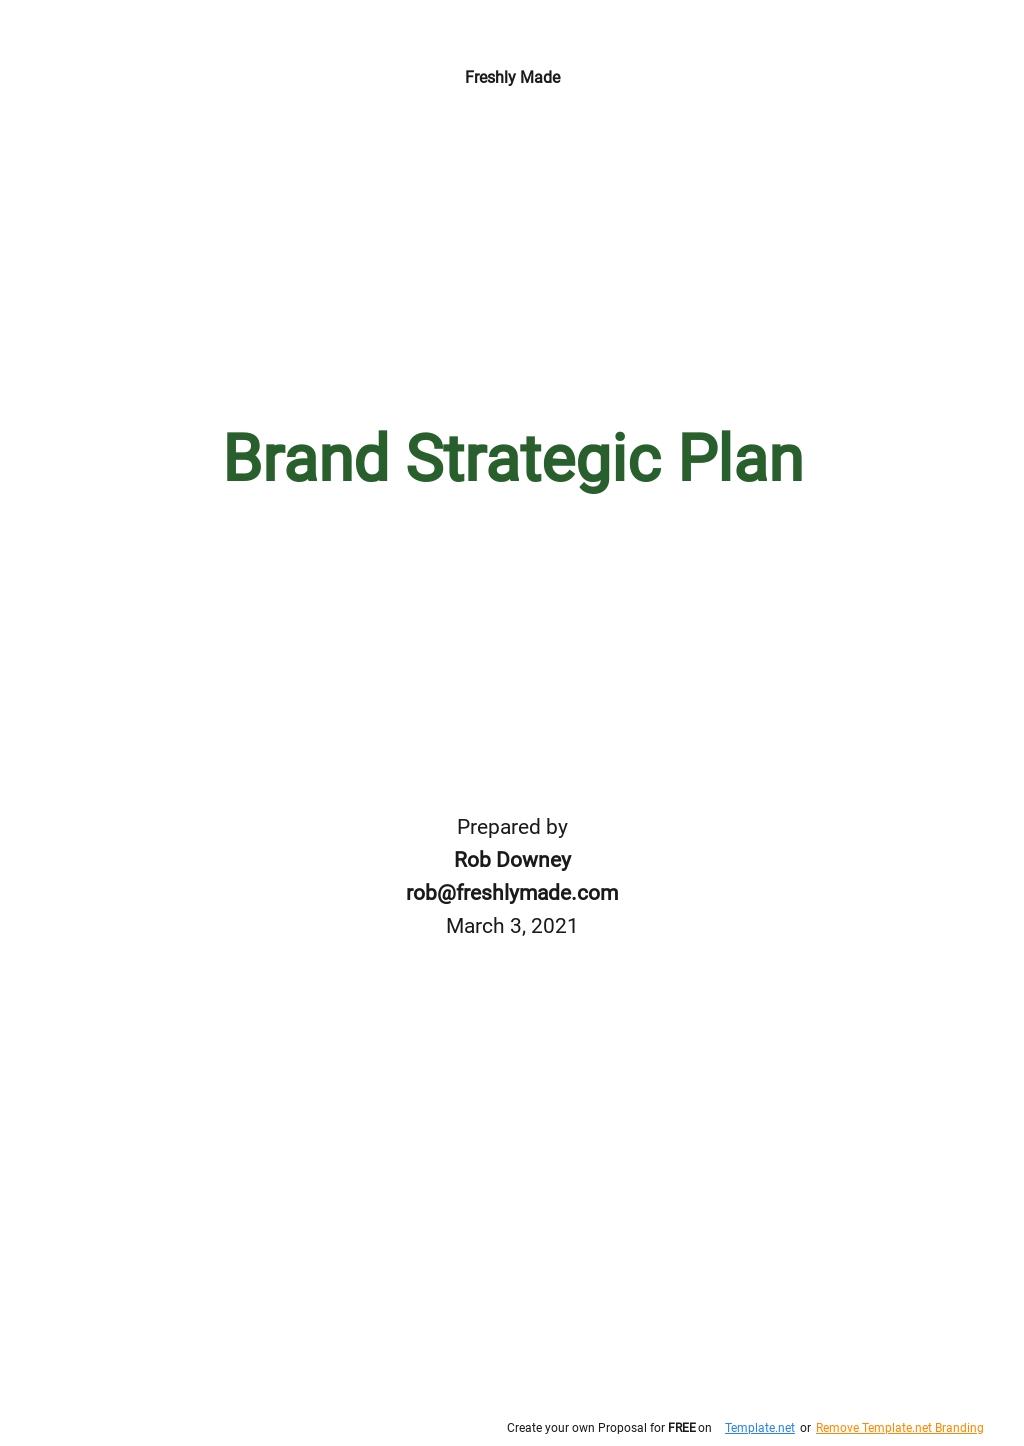 Brand Strategic Plan Template.jpe